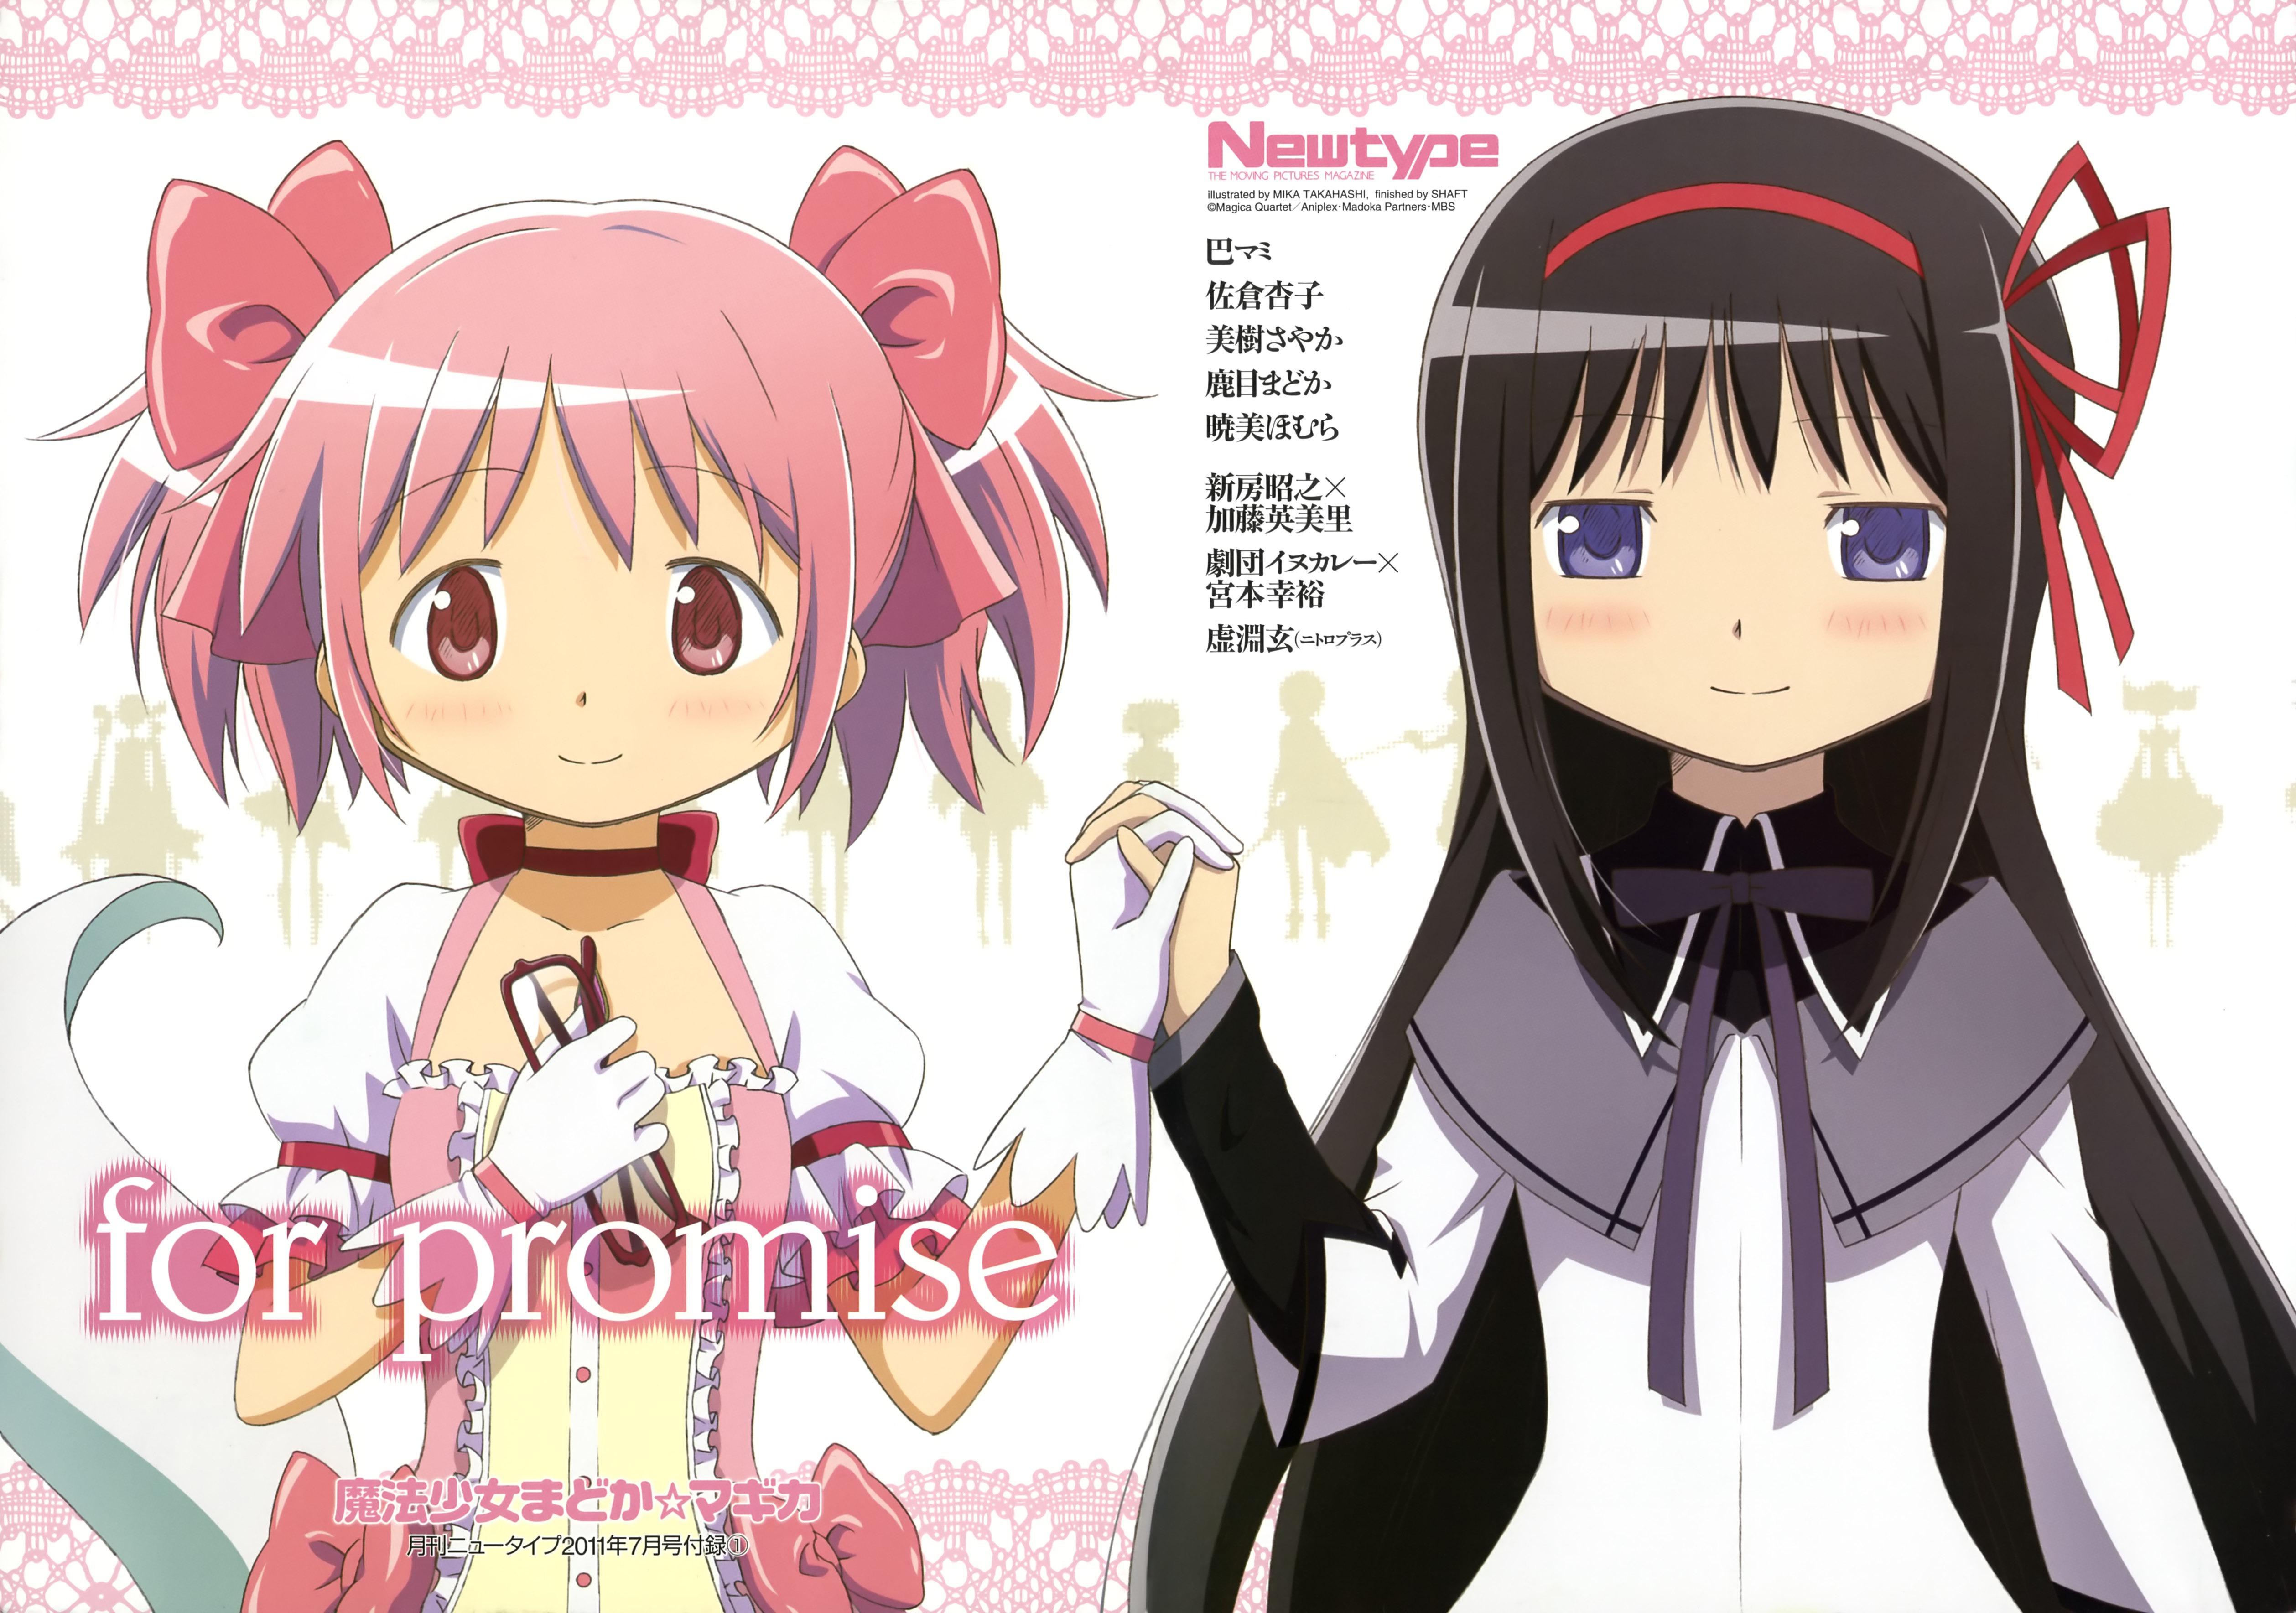 Mahou Shoujo Madoka Magica Magical Girl Madoka Magica Image Zerochan Anime Image Board